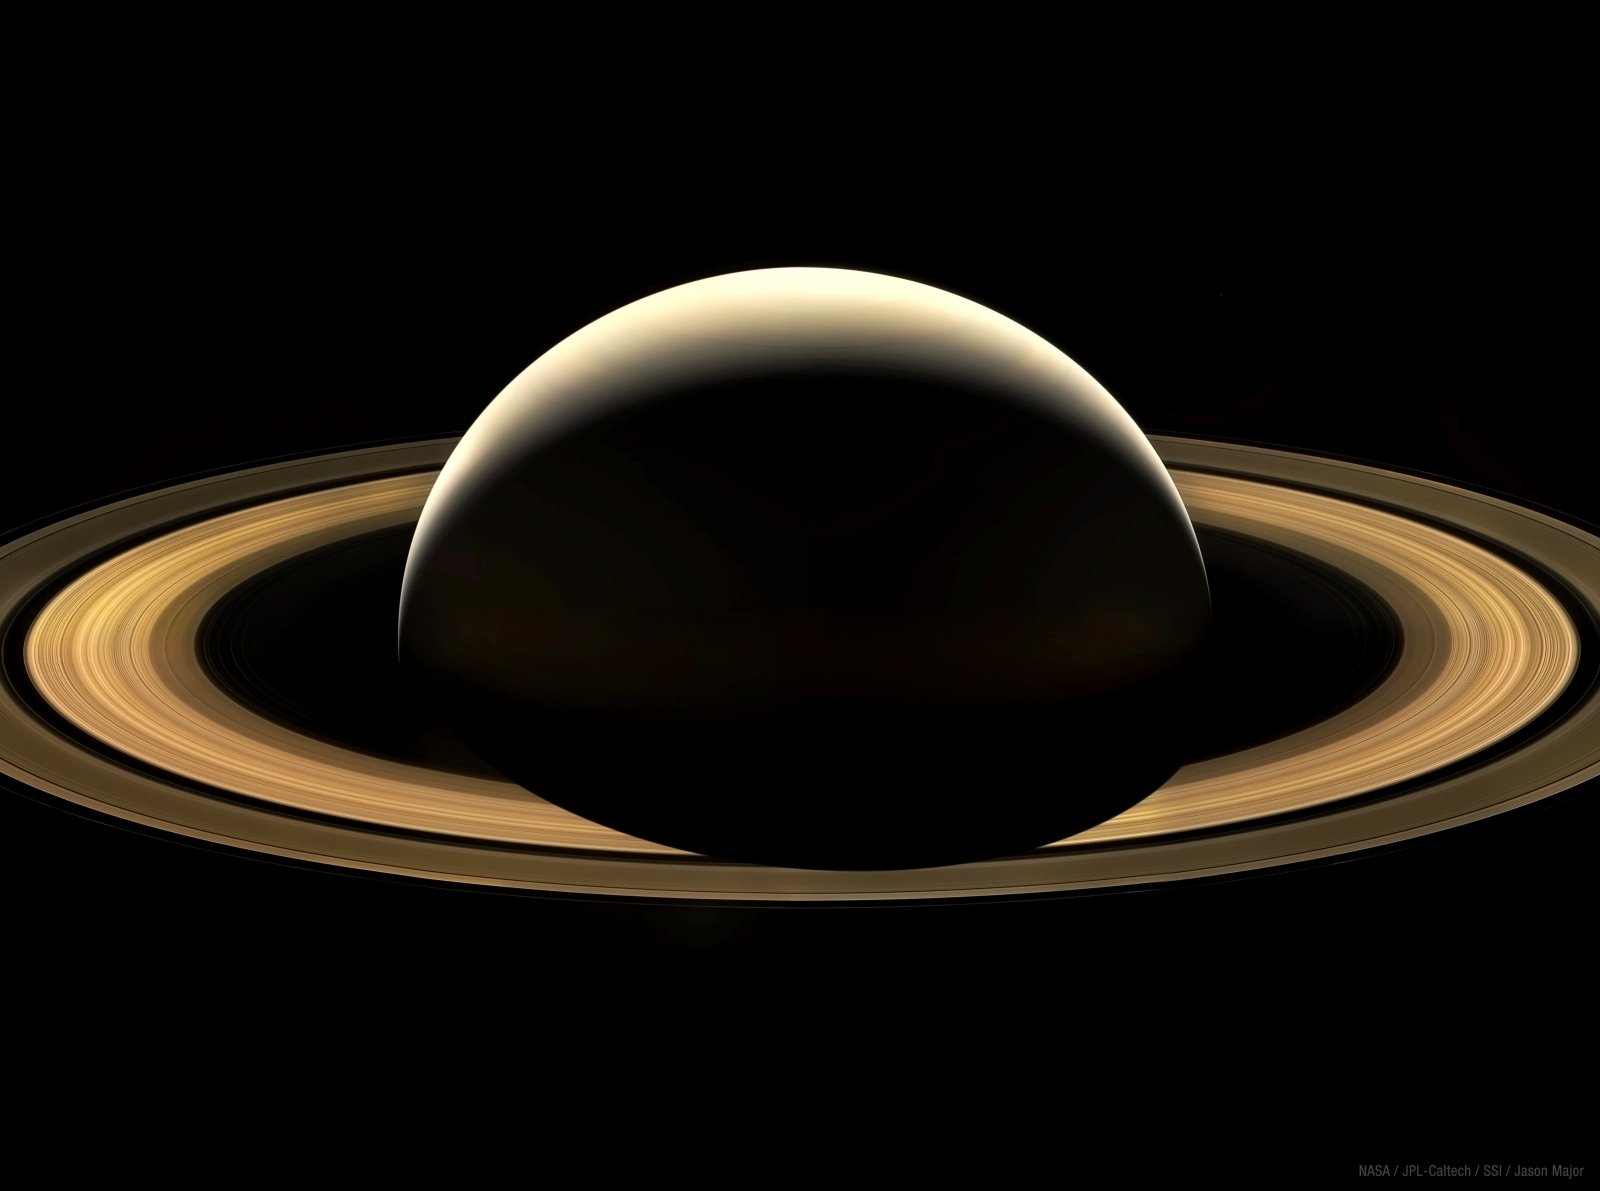 Cassinis Final Mosaic of Saturn